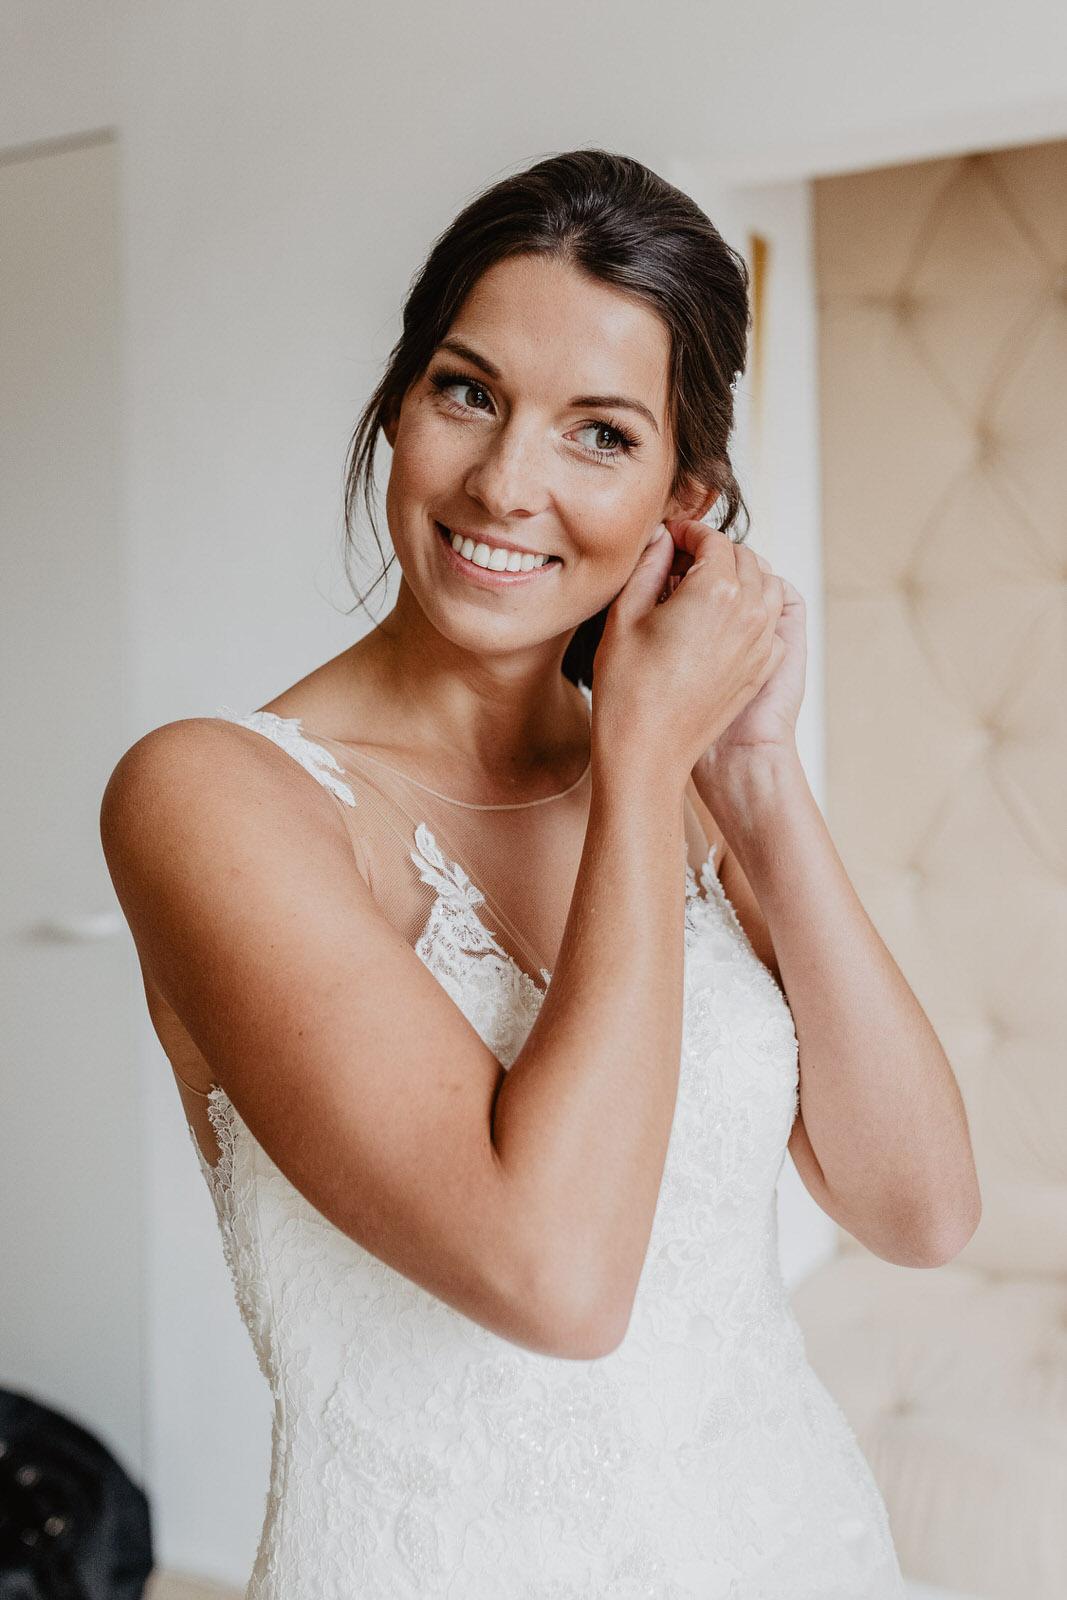 Christina-Hohner_Photography_Hochzeitslocation_Magical-Homes_Heroldstatt-8-von-65.jpg